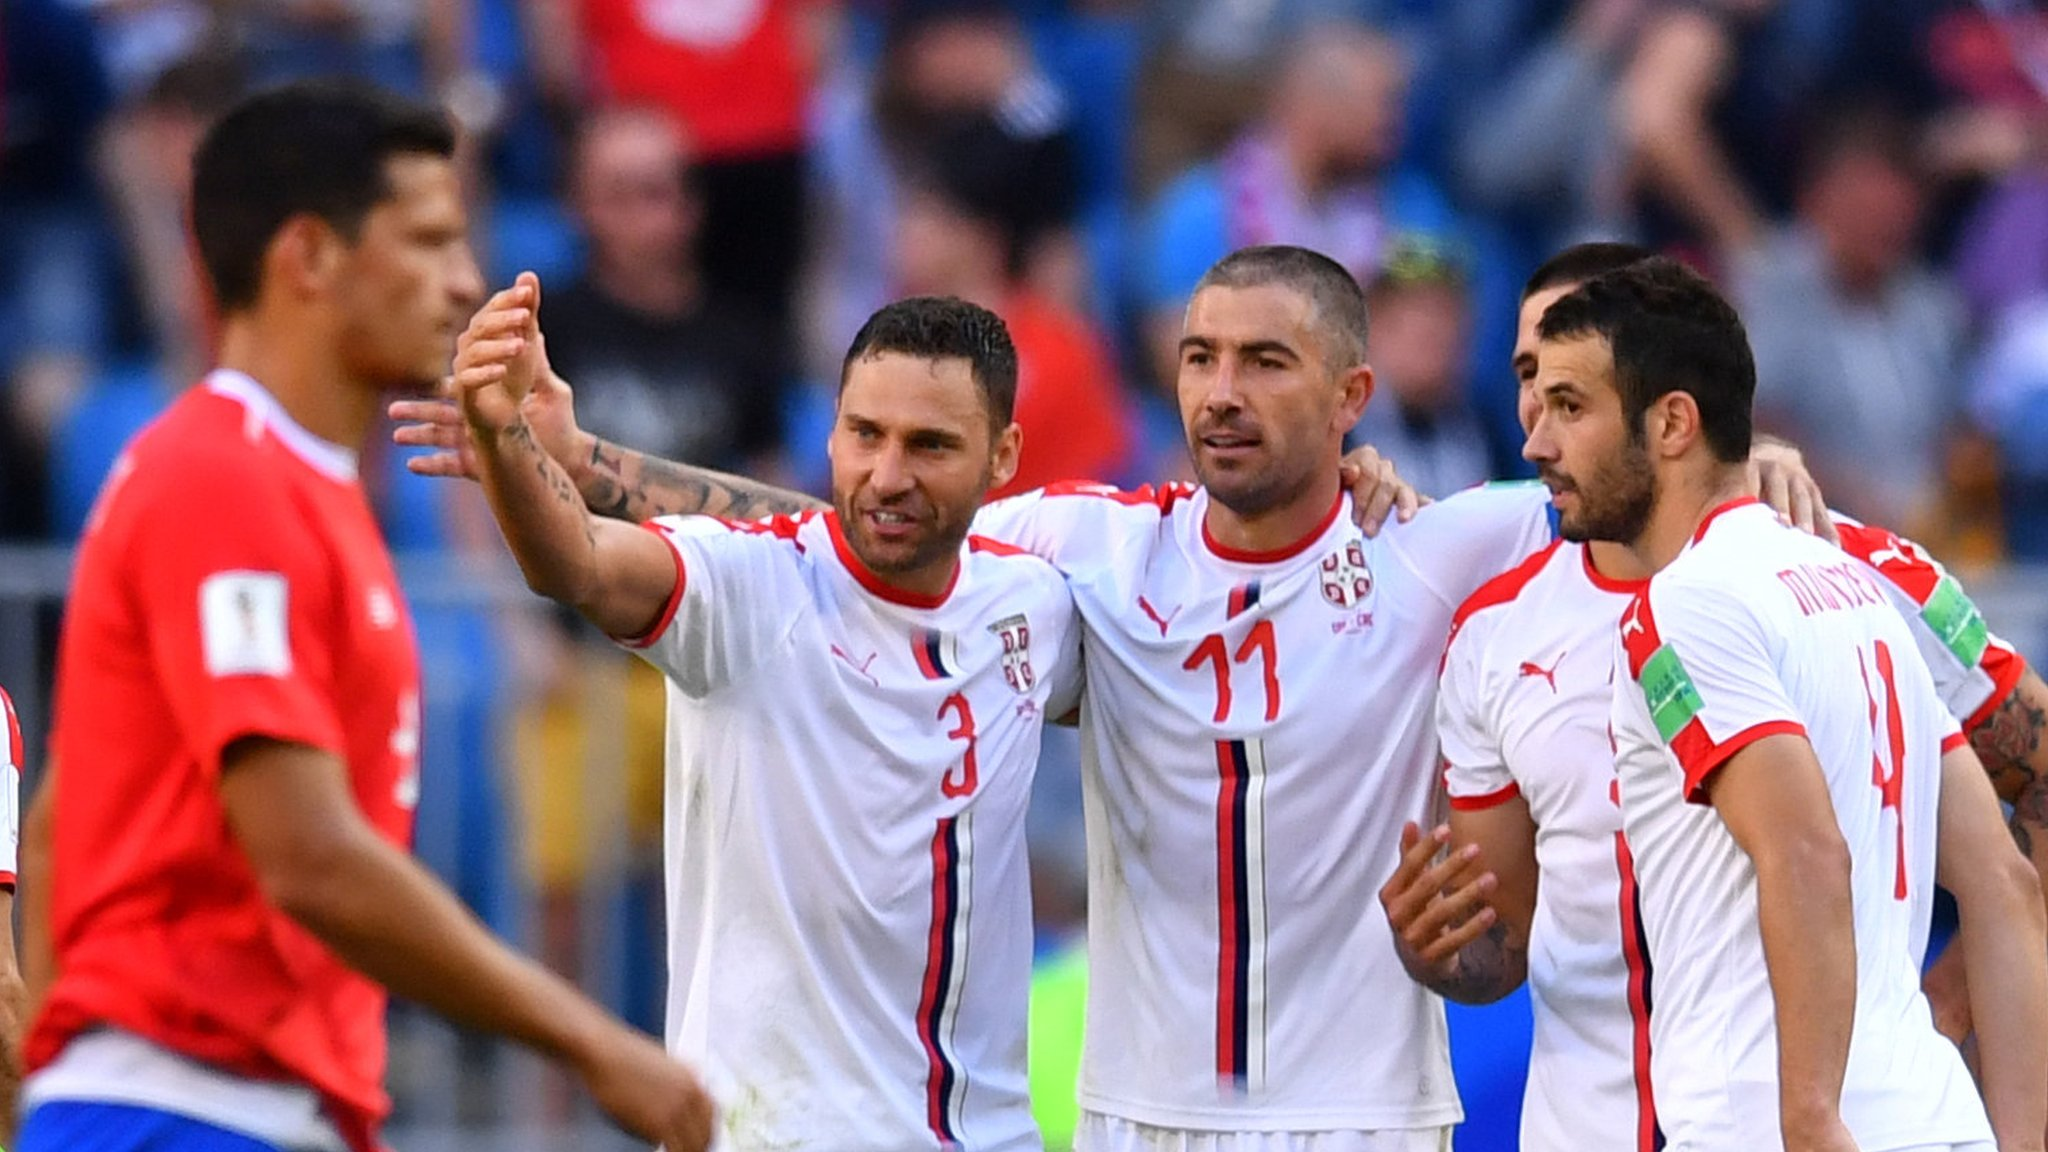 Kolarov's stunning free-kick gives Serbia victory over Costa Rica